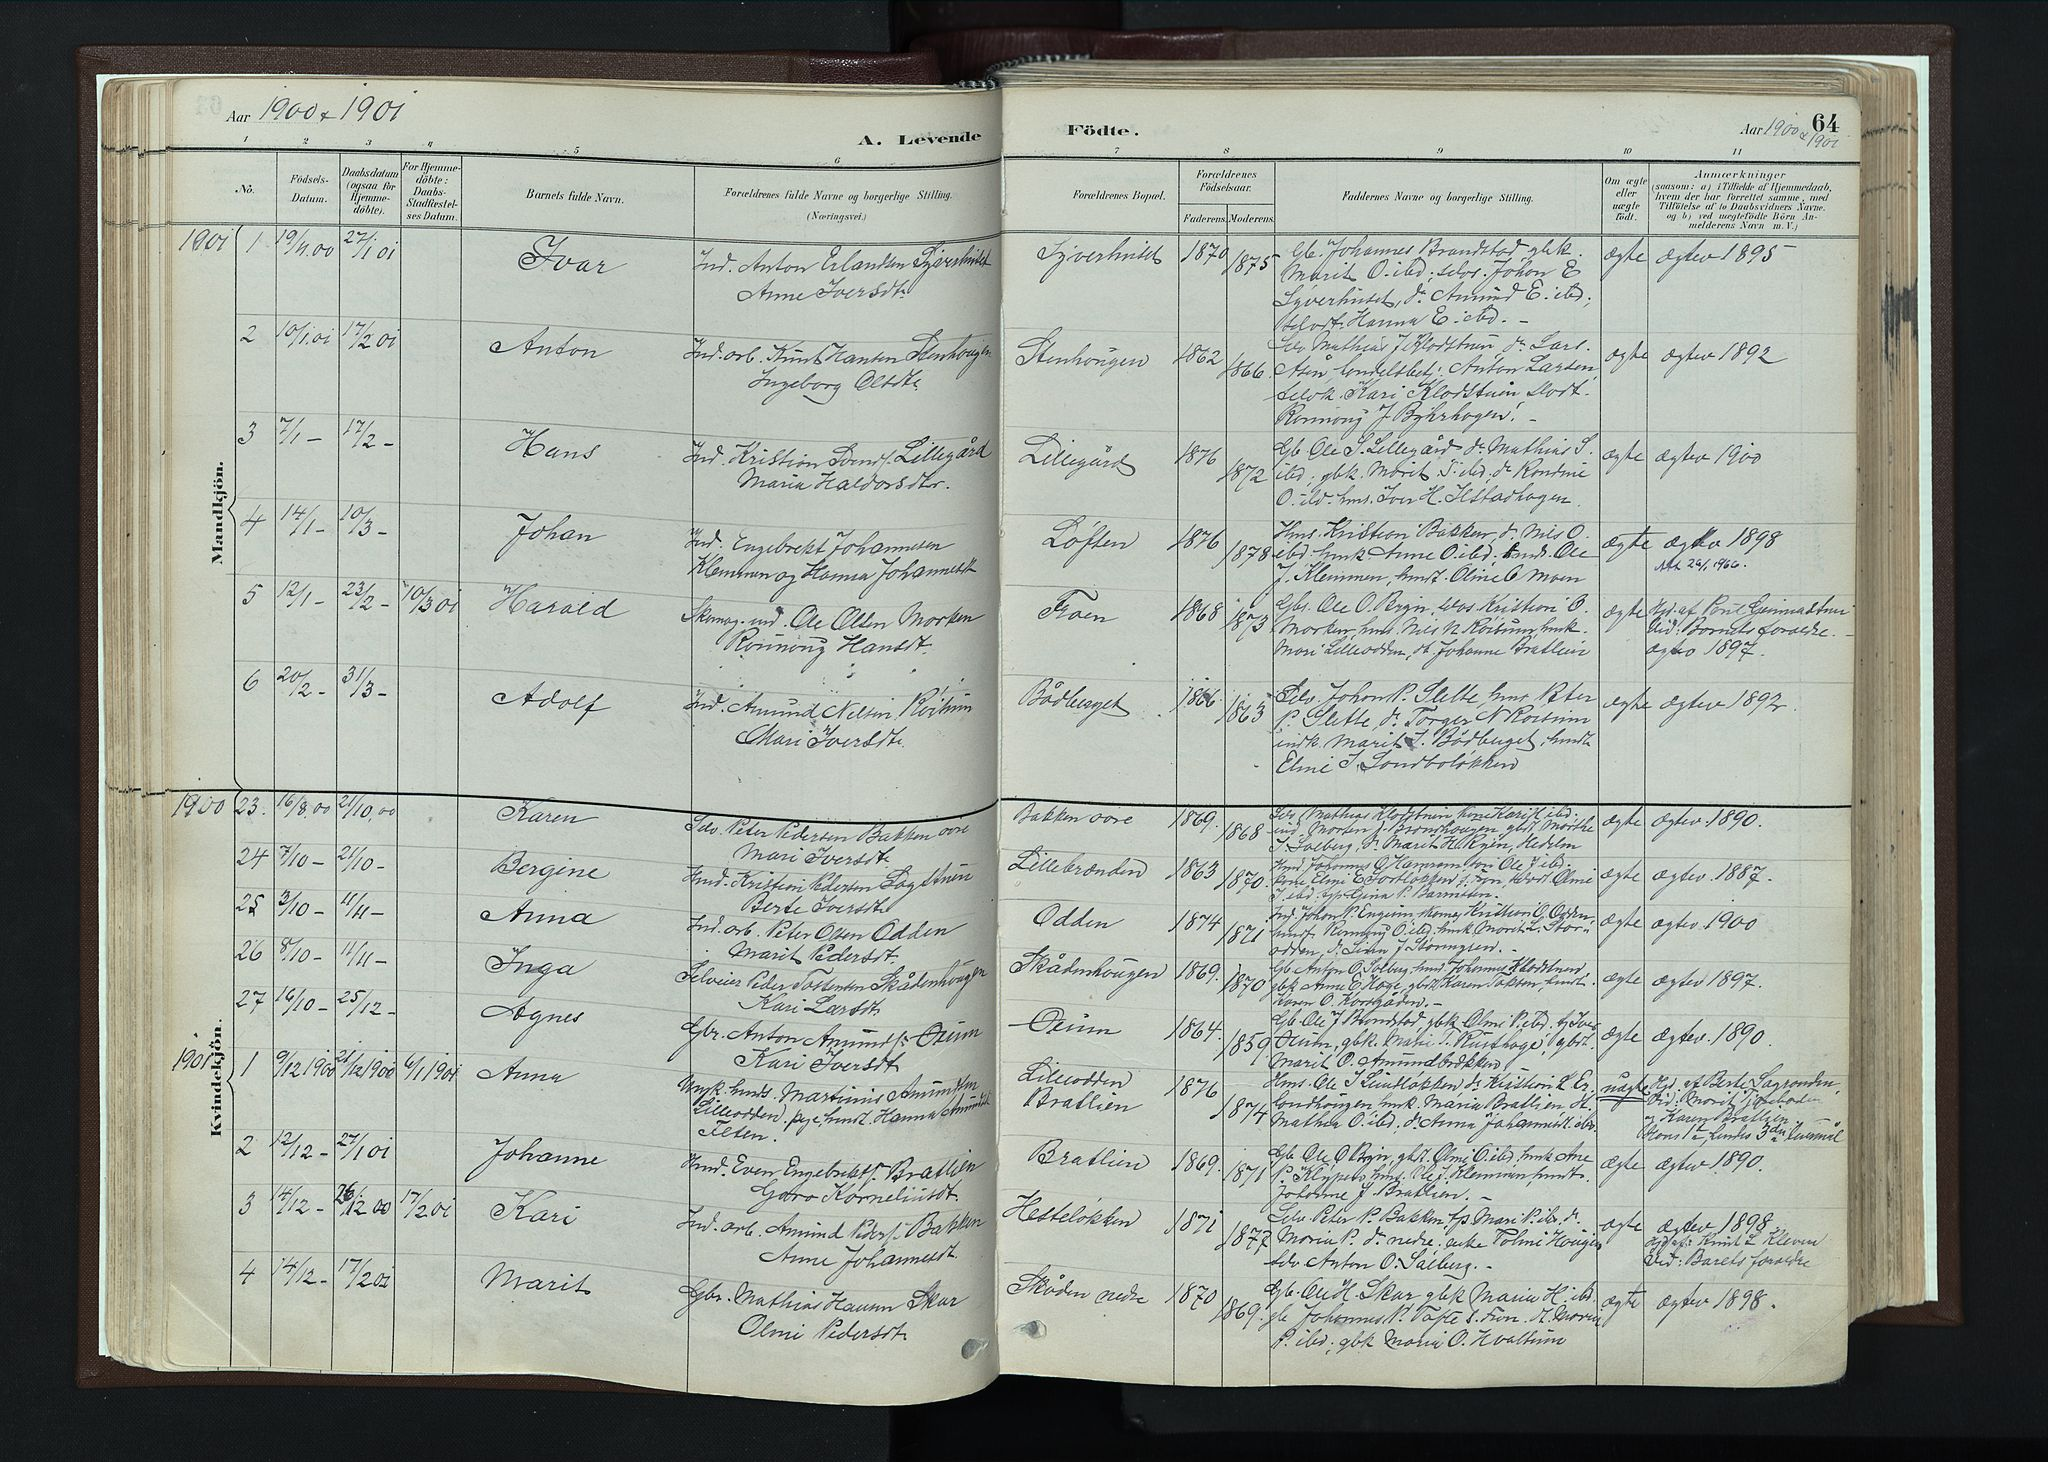 SAH, Nord-Fron prestekontor, Ministerialbok nr. 4, 1884-1914, s. 64